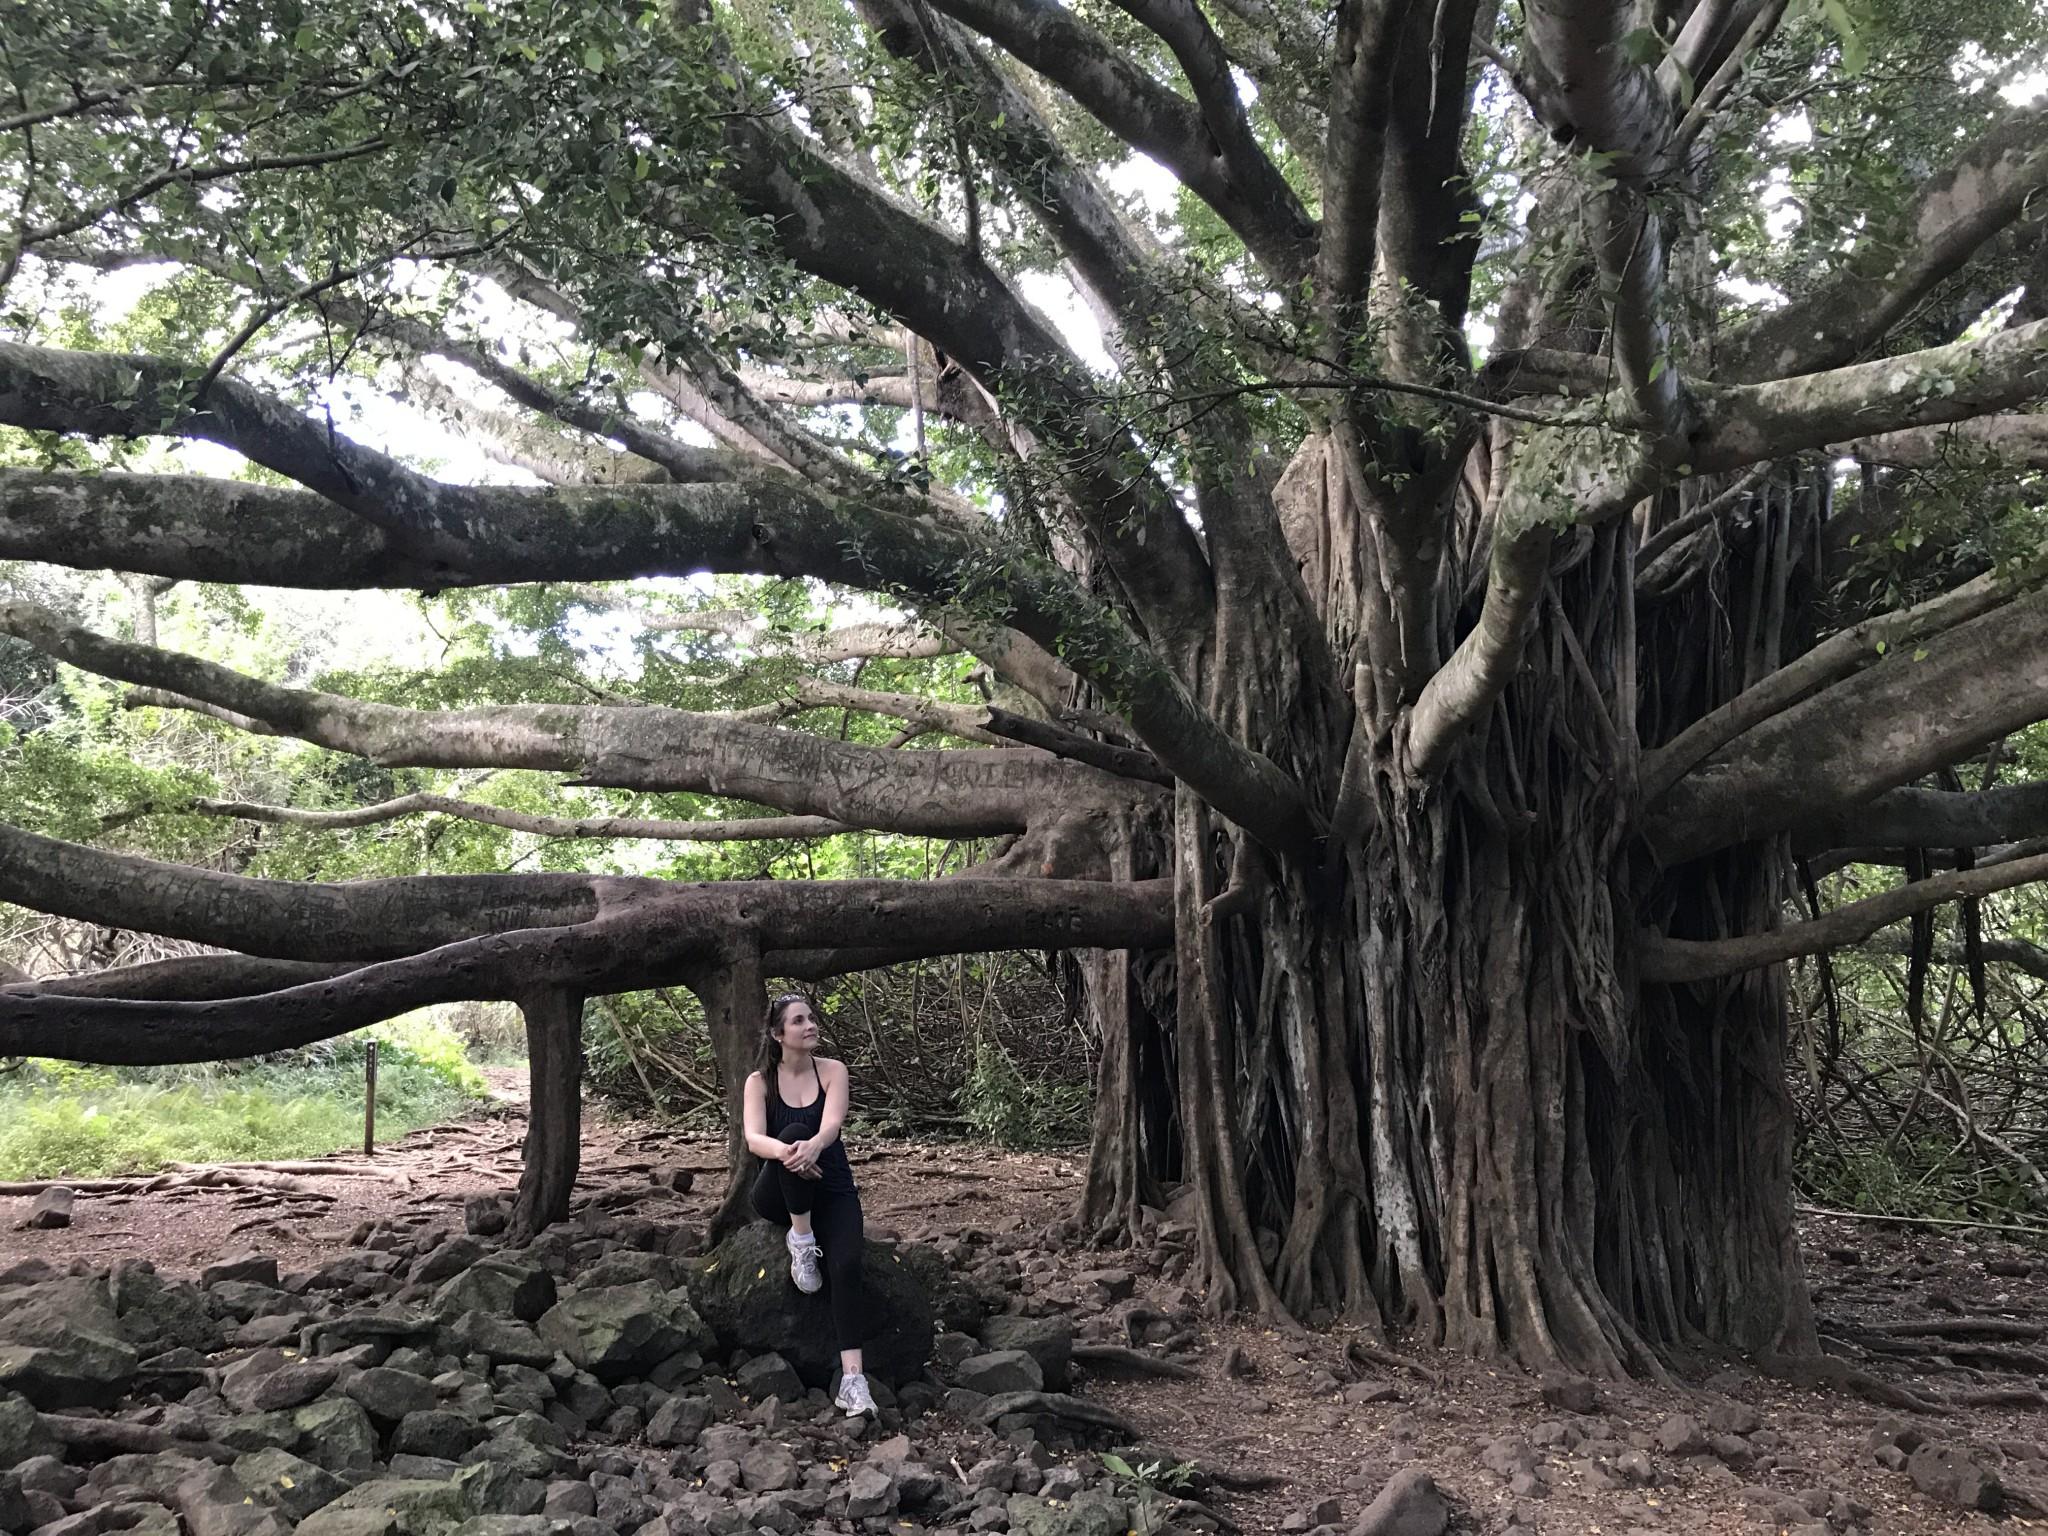 banyan tree, road to hana, haleakala national park, the-alyst.com